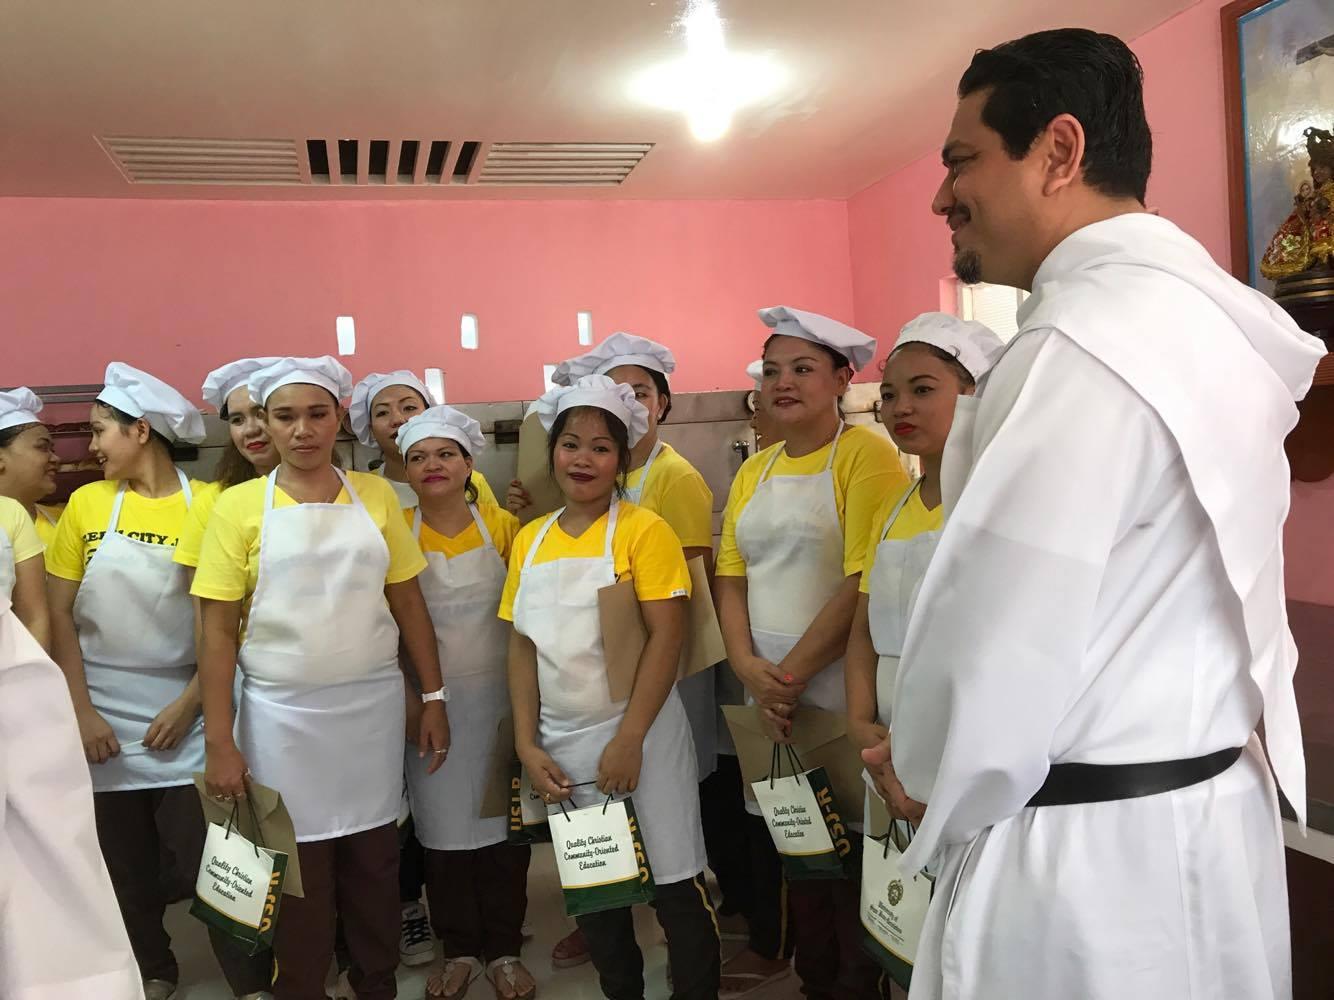 Filipinas-Horno-Carcel-Mujeres-6